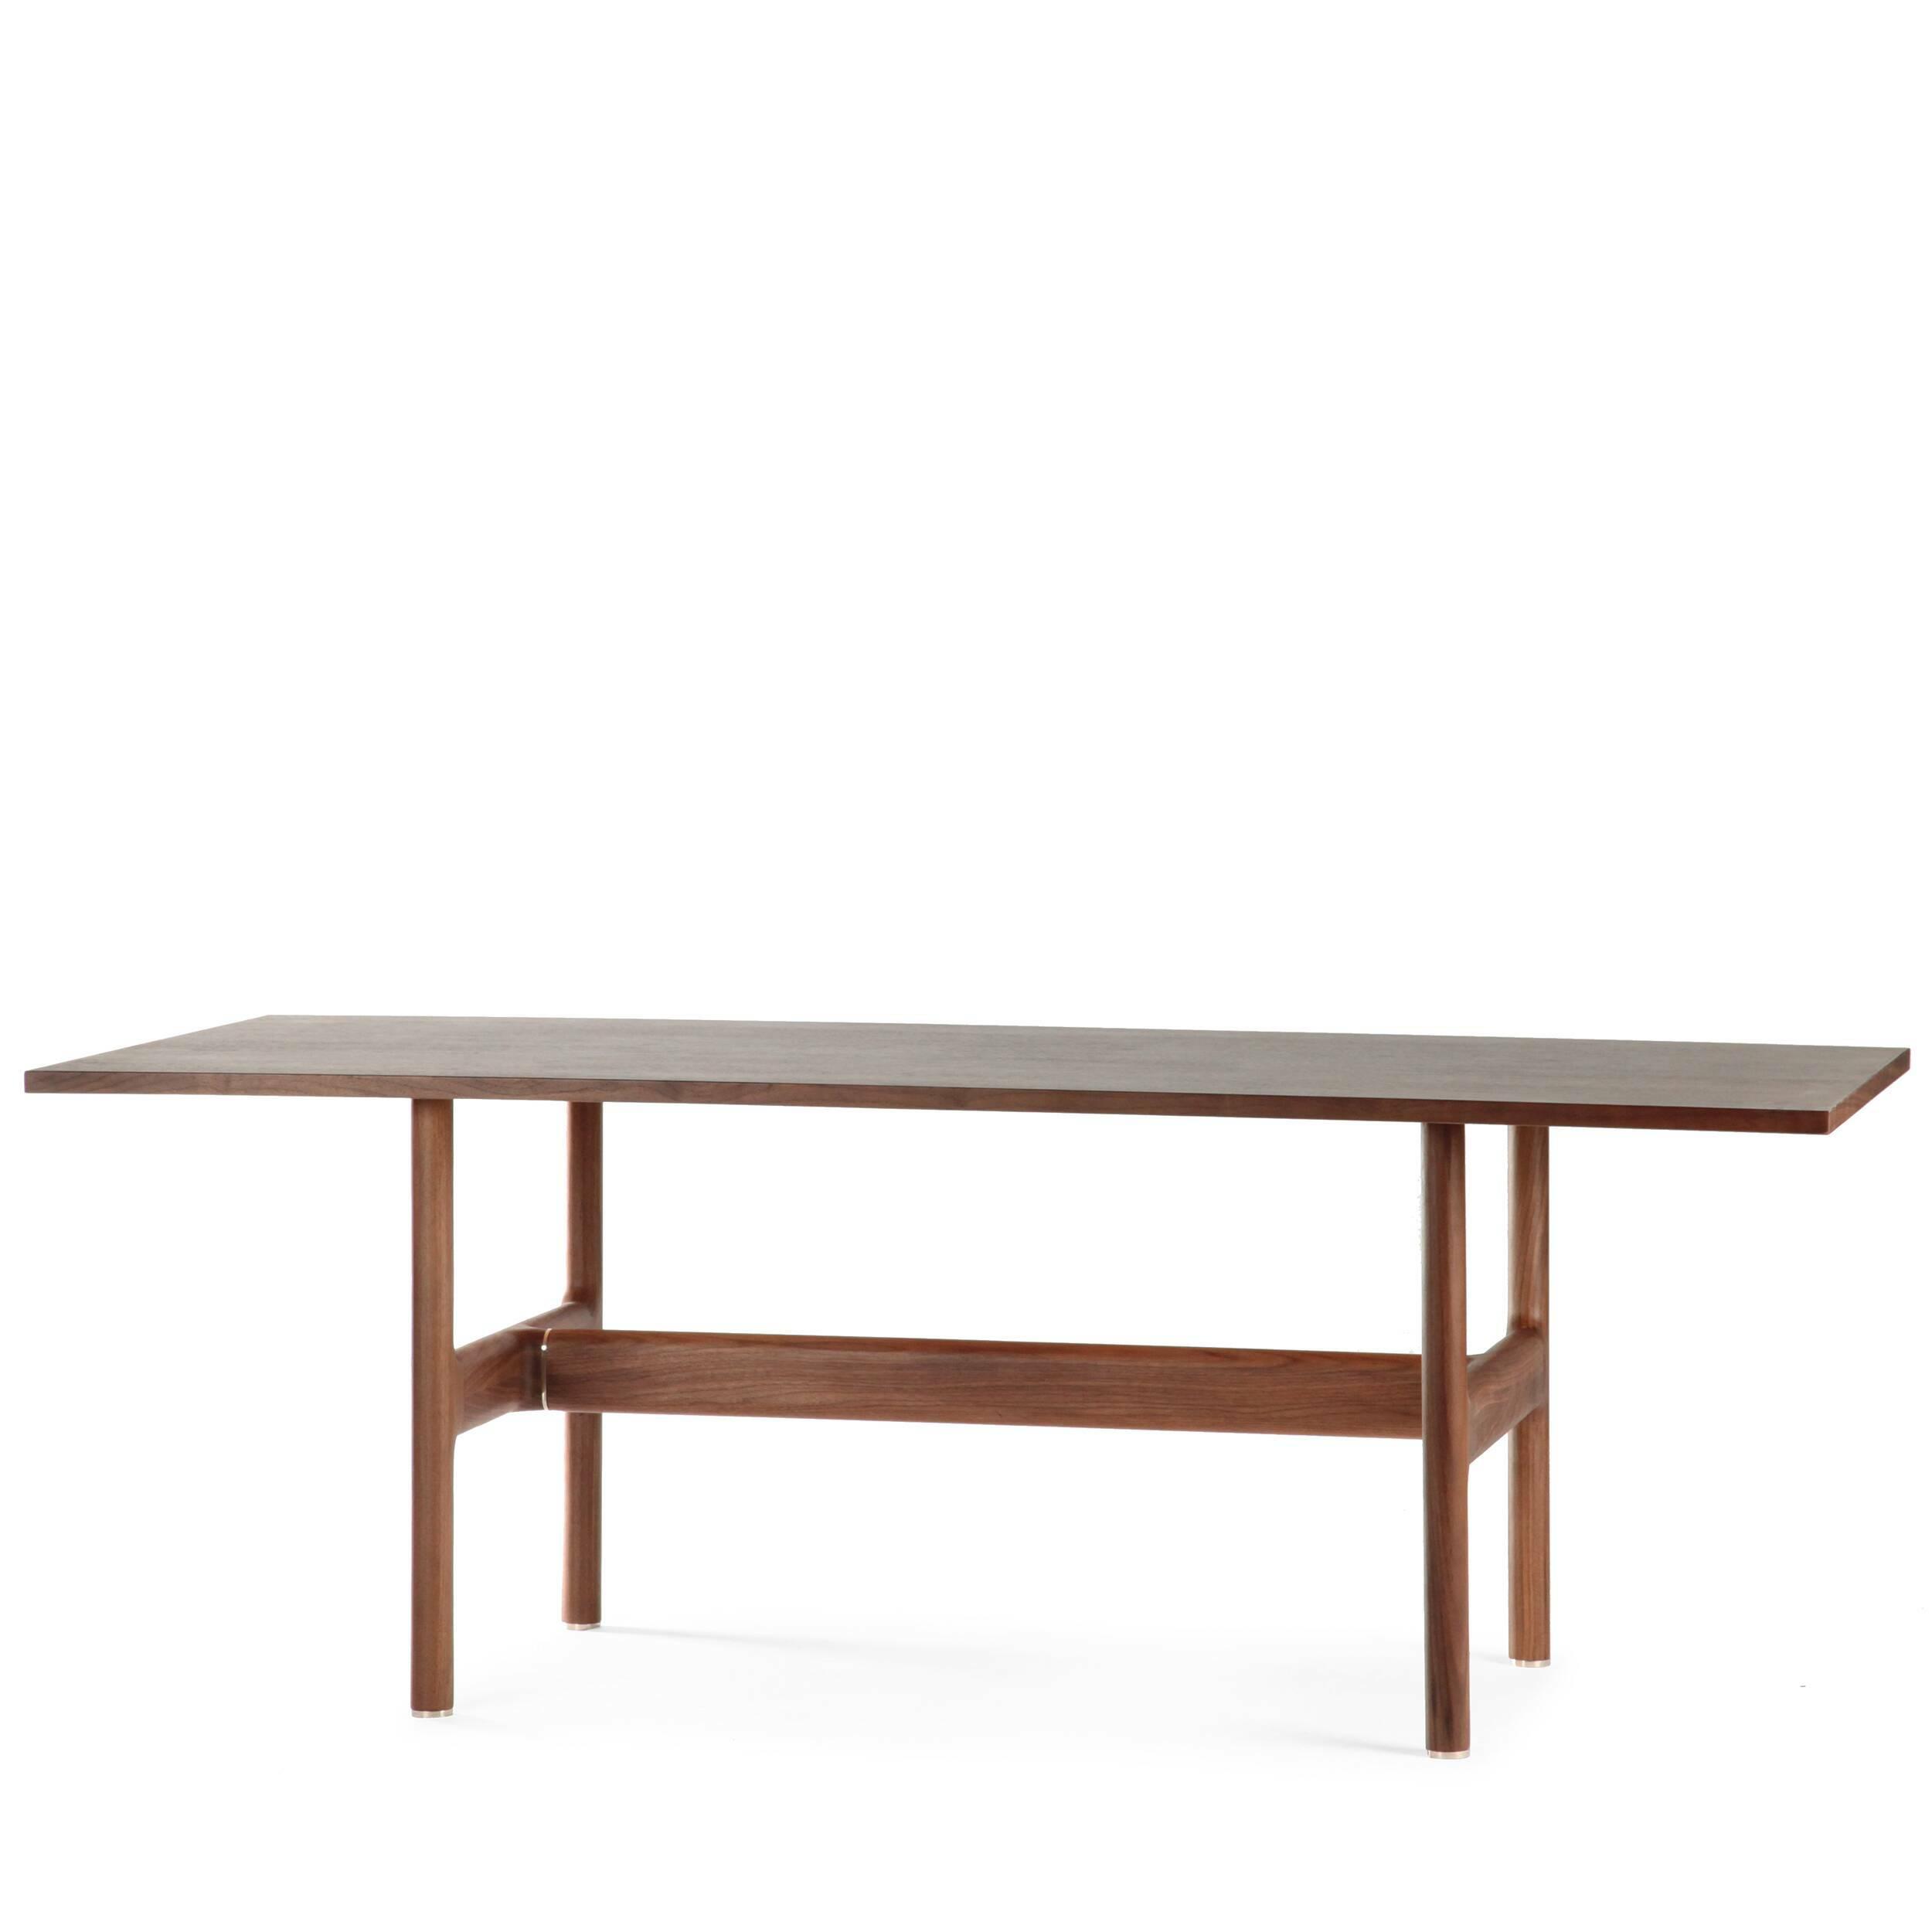 Обеденный стол Trestle стол обеденный опора металл орех монпелье 432903 шатура столы обеденные